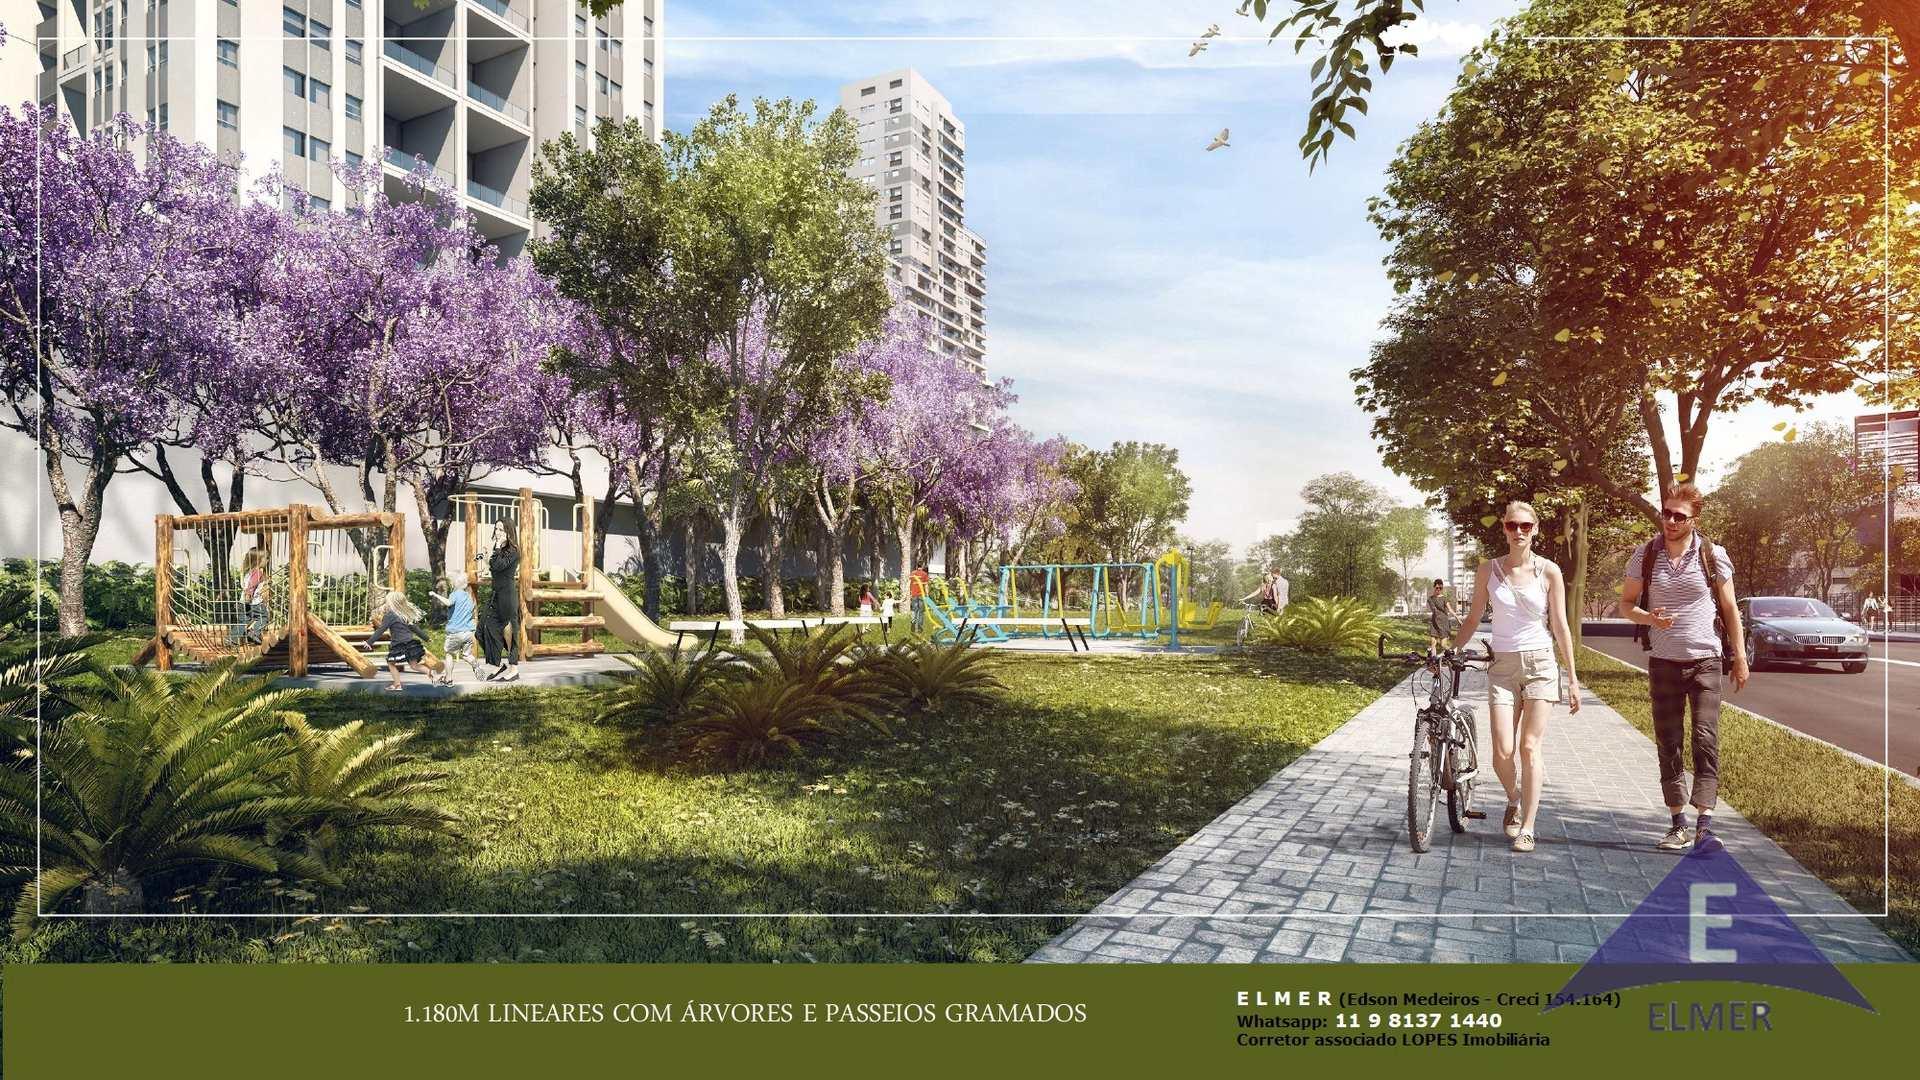 JERIVAS - Fachada e Rua Jardim 2 - ELMER